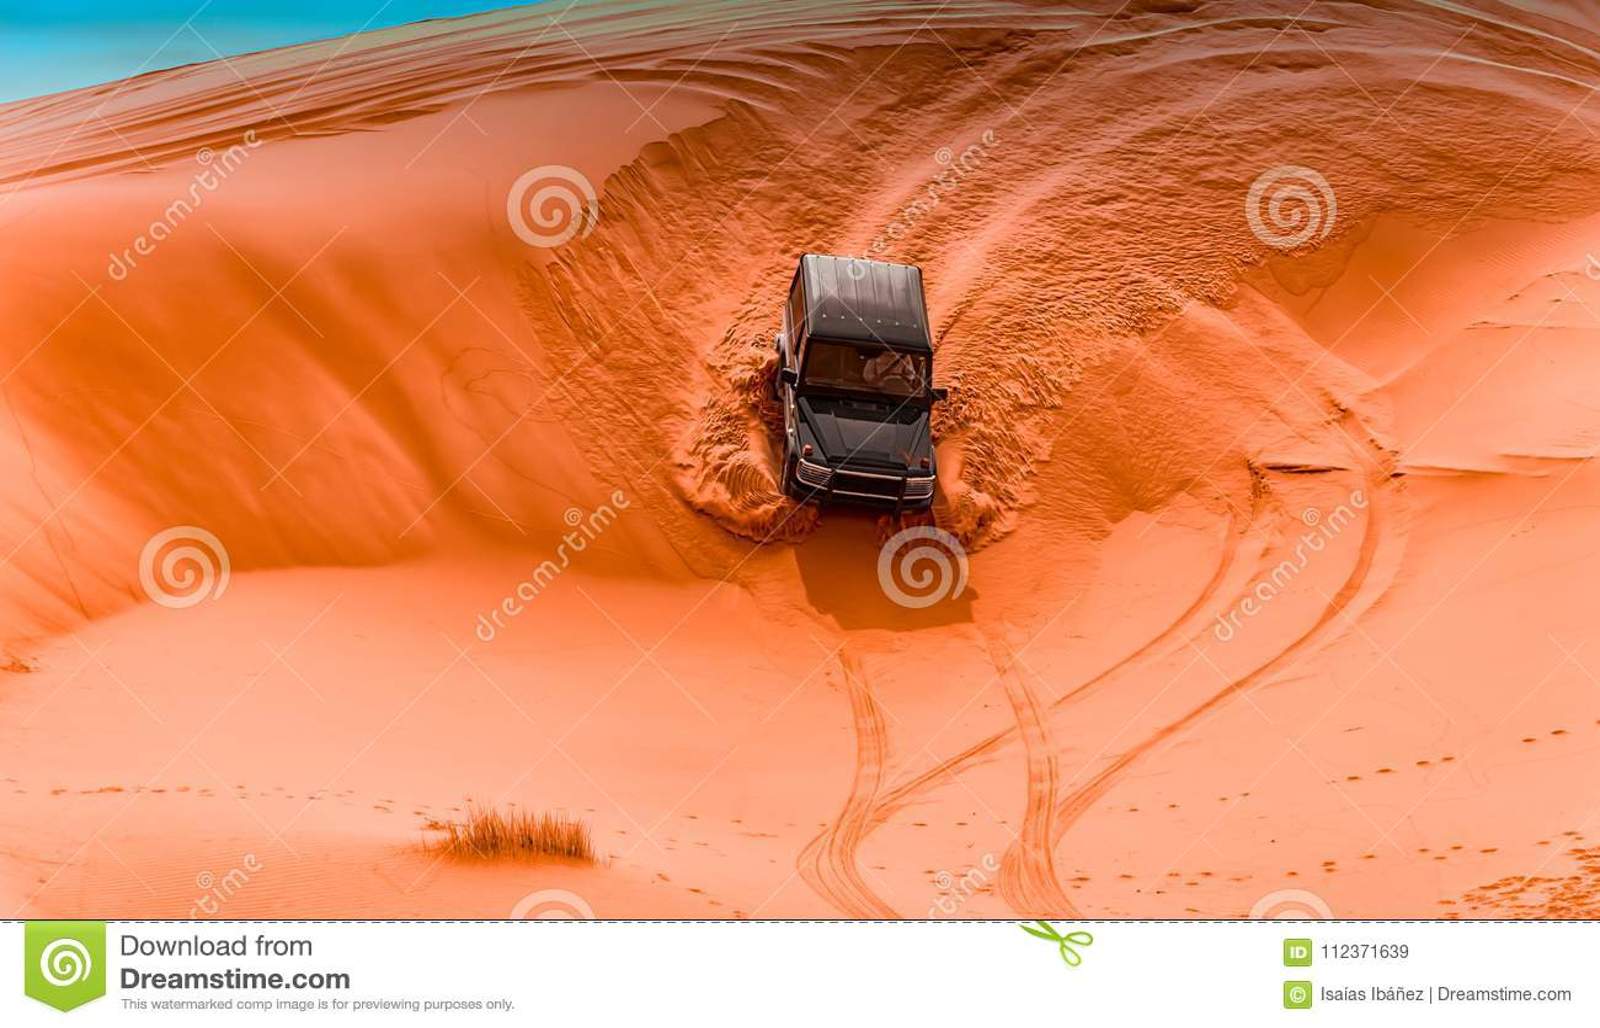 Allradfahrzeuge und Dünen